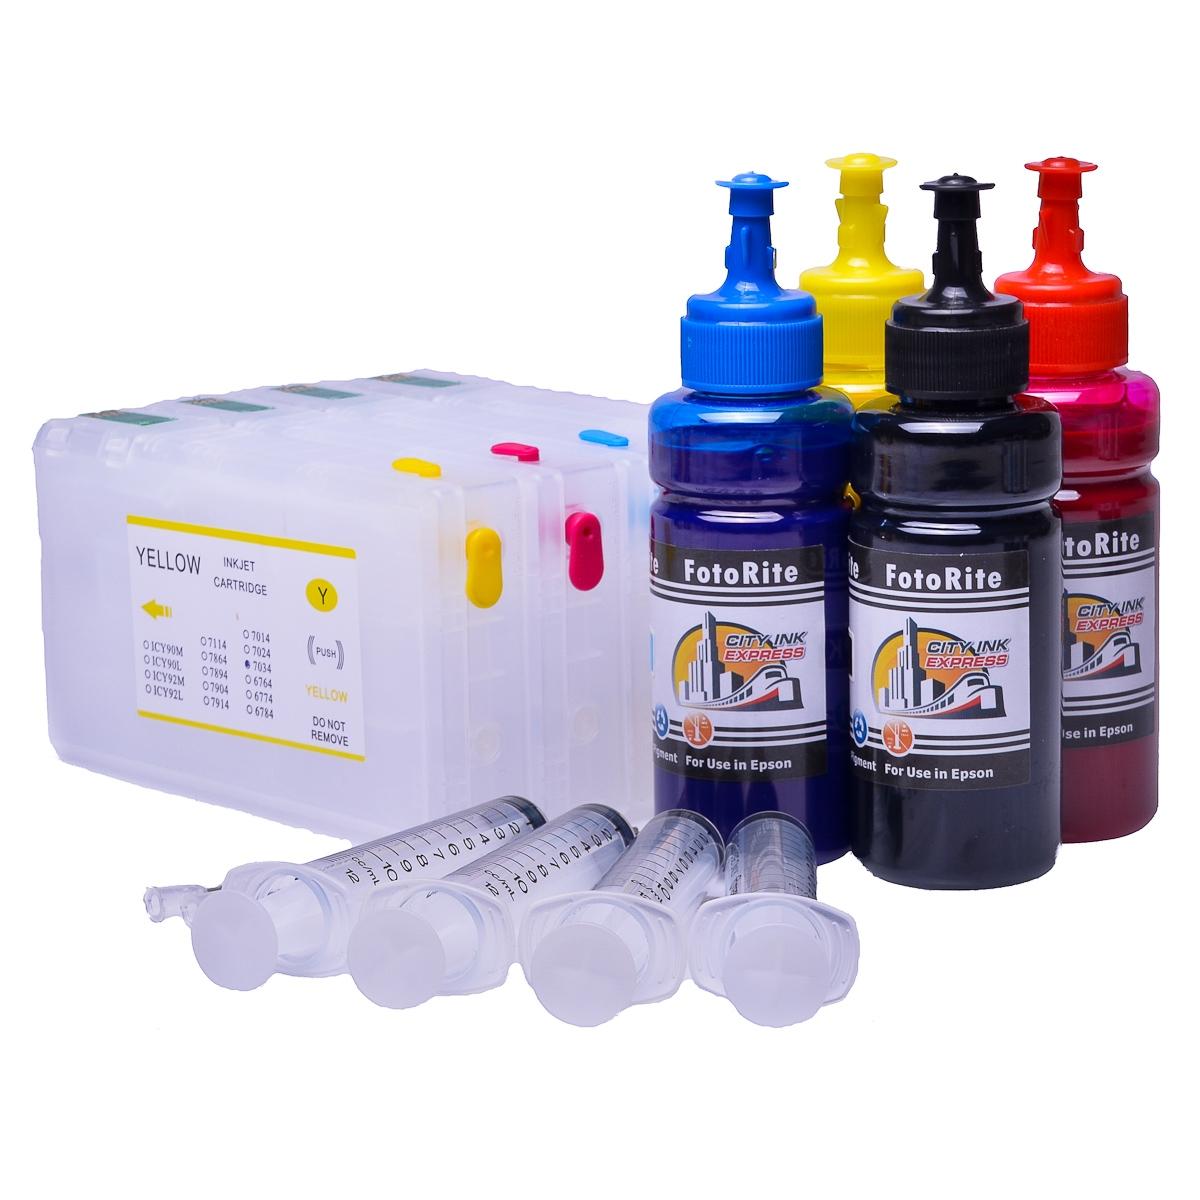 Refillable pigment Cheap printer cartridges for Epson WF-4640DTWF C13T79154014 T7911-4 Multipack